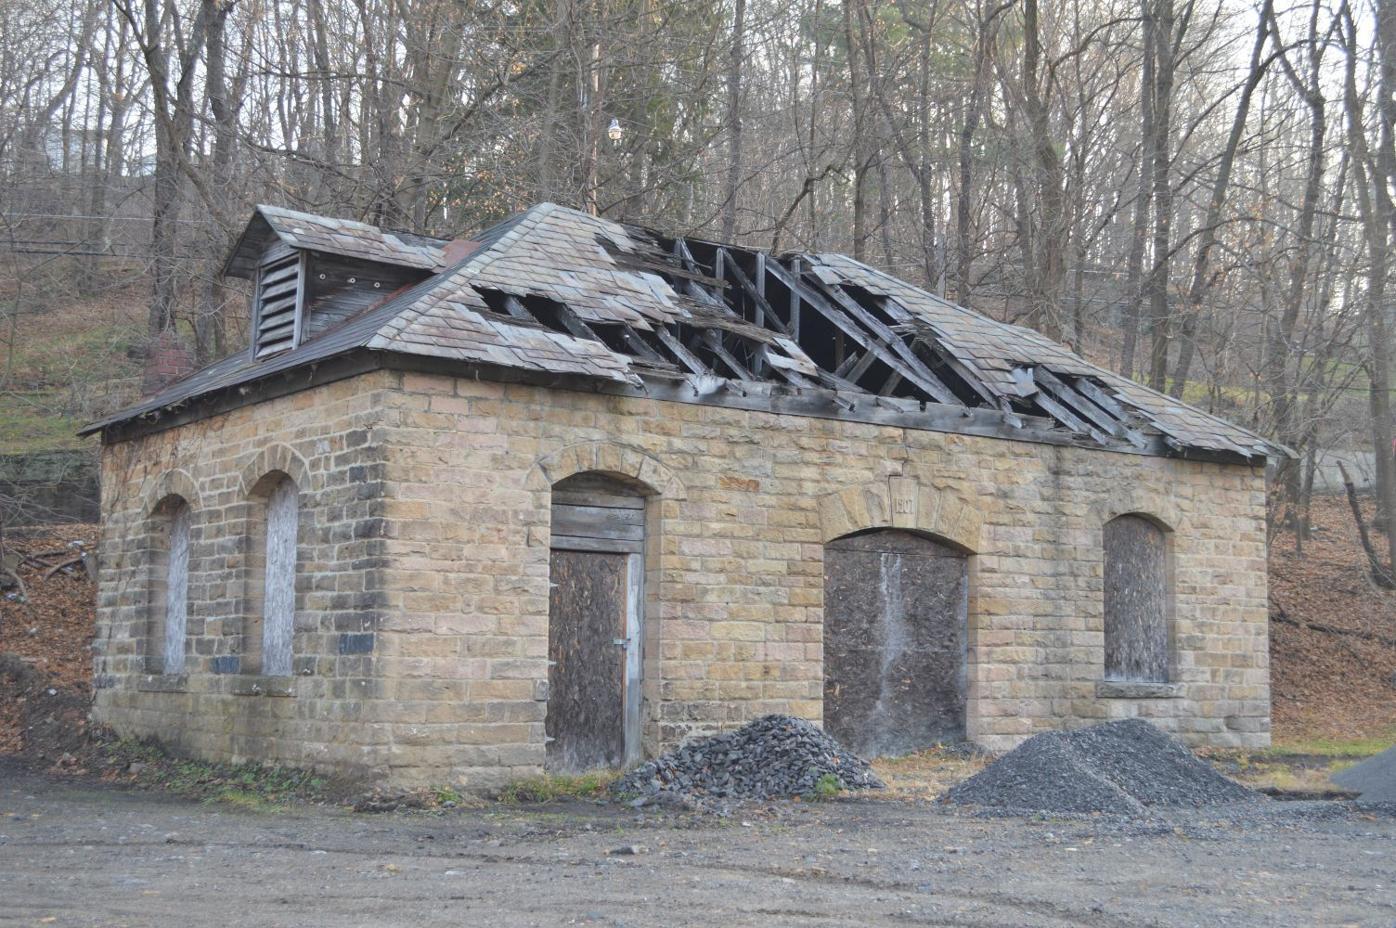 Elkins Coal & Coke Shop